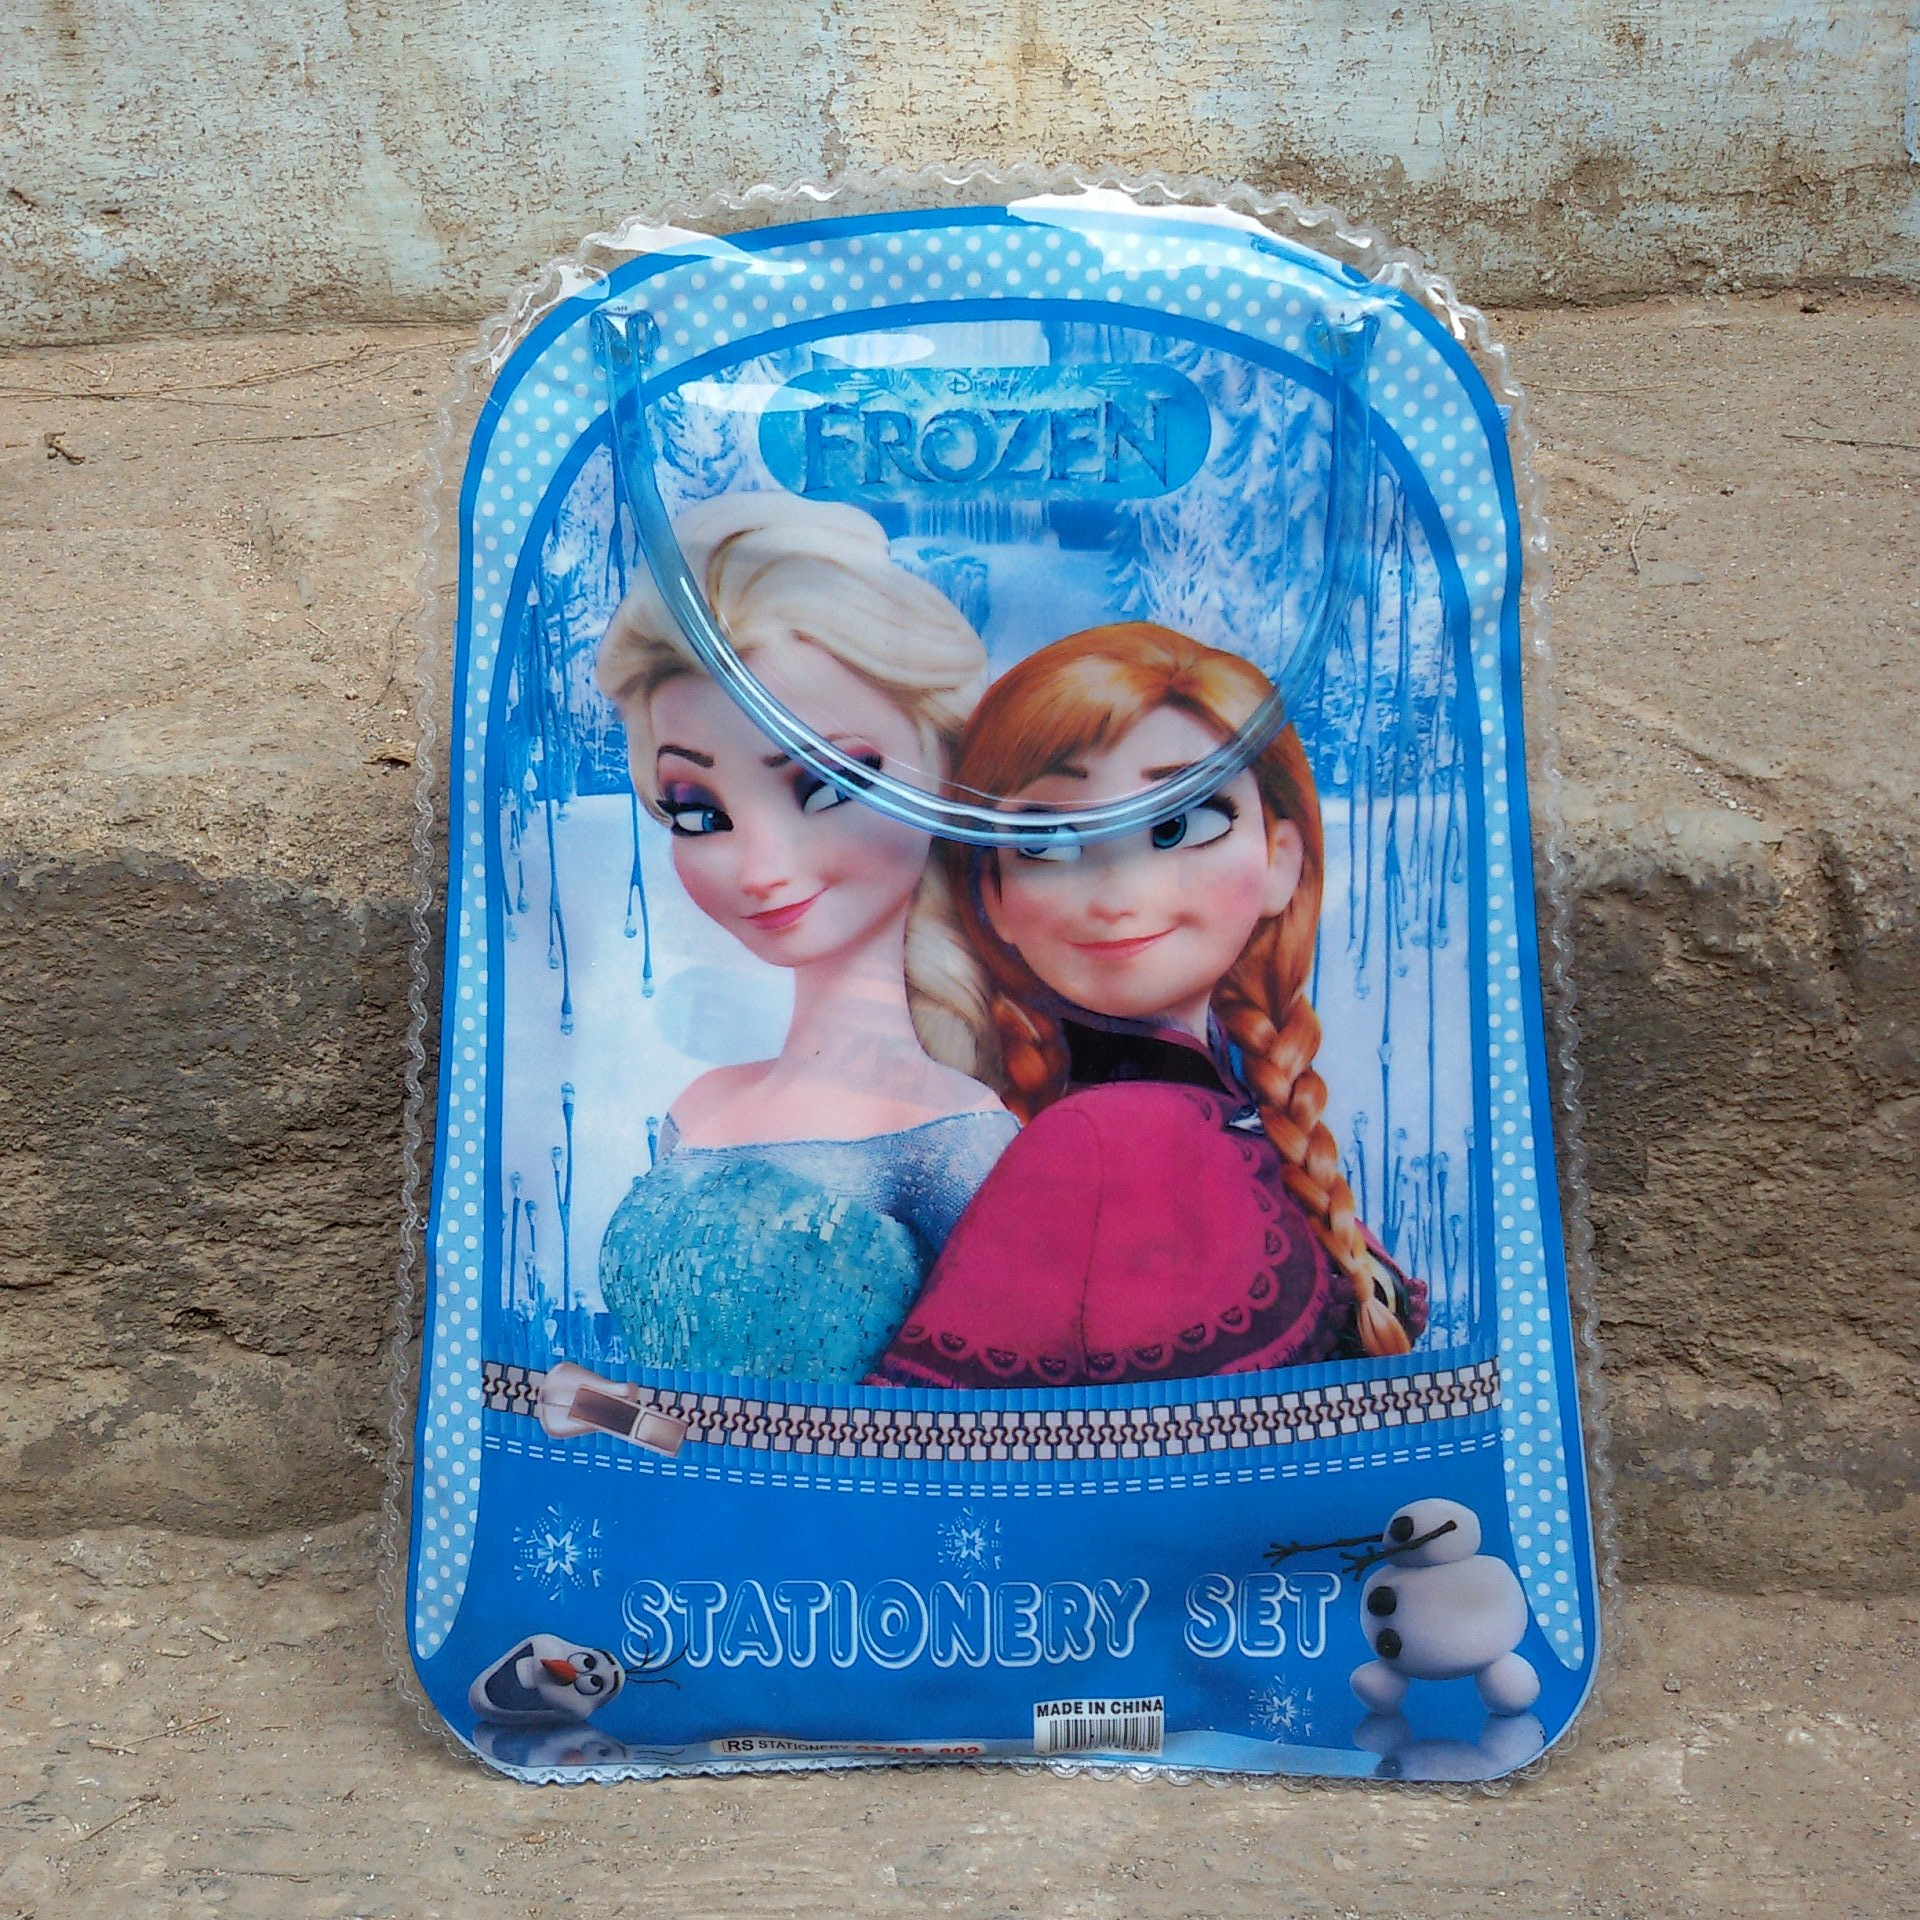 Jual Paket Alat Tulis Set Tas Jinjing Mini Frozen Blue Stationery 1 Gift Kellybutiq Tokopedia